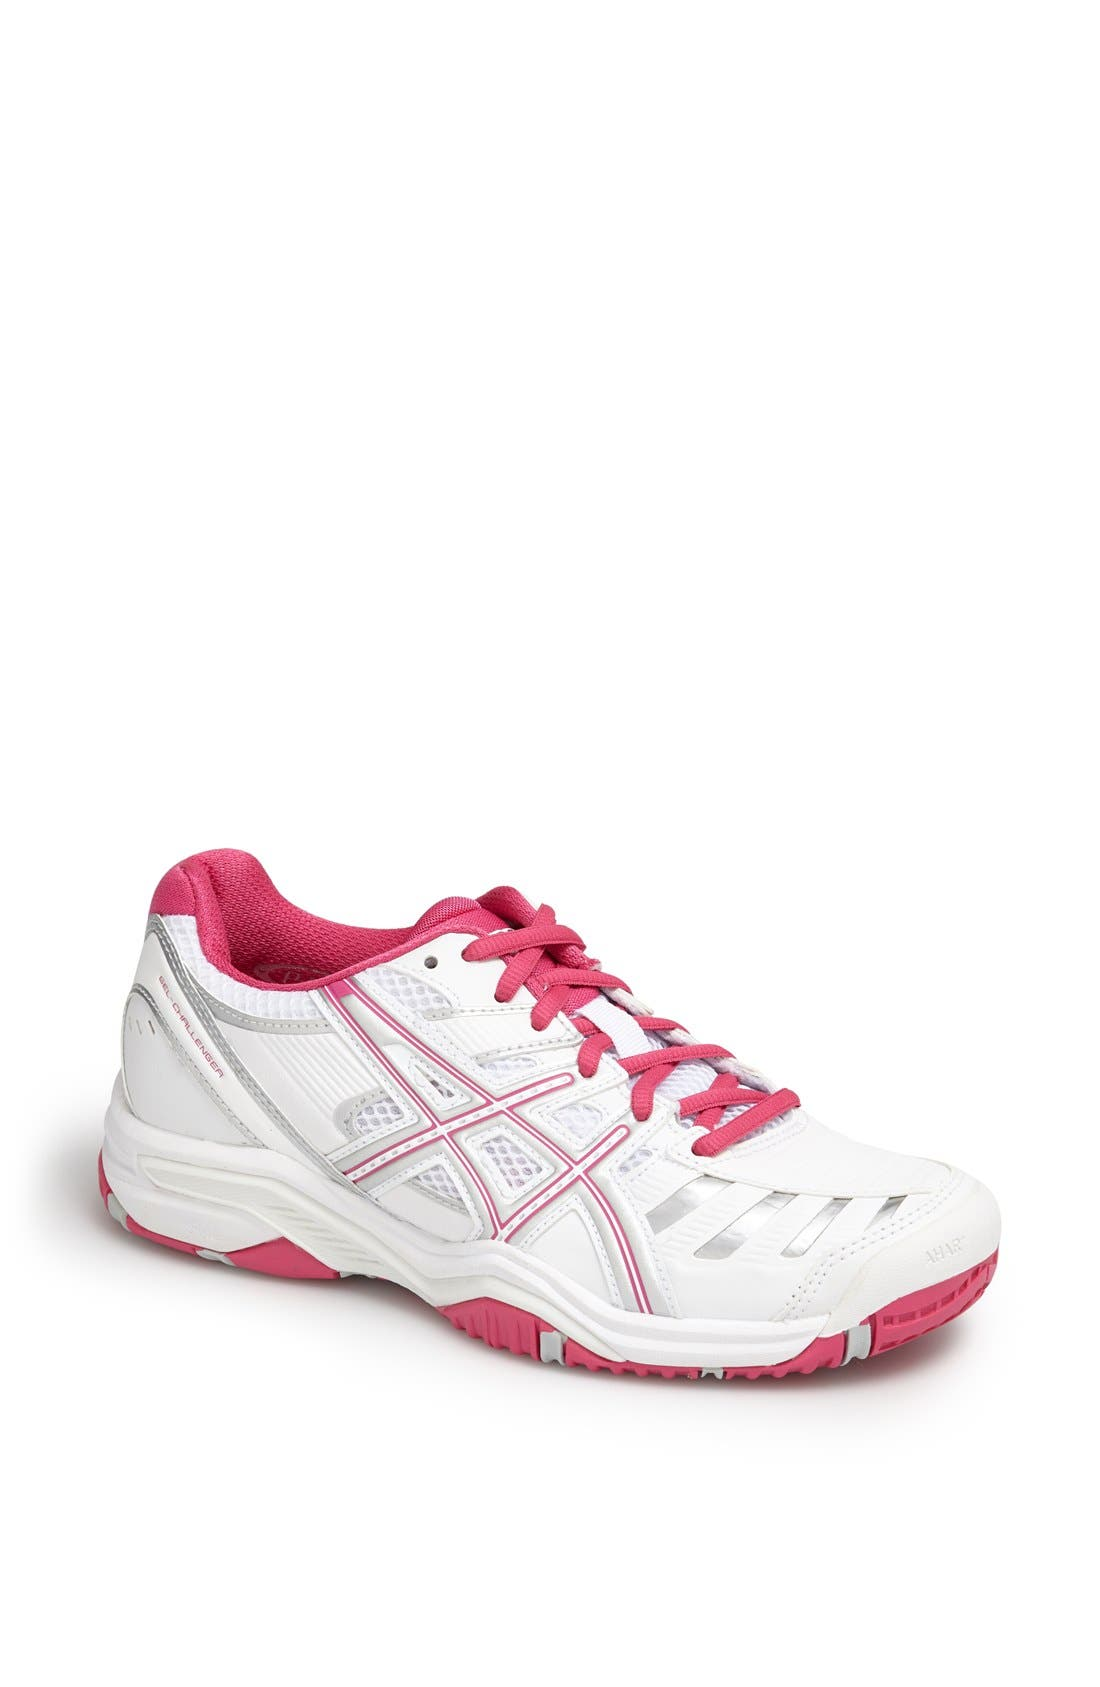 Main Image - ASICS® 'GEL-Challenger 9' Tennis Shoe (Women)